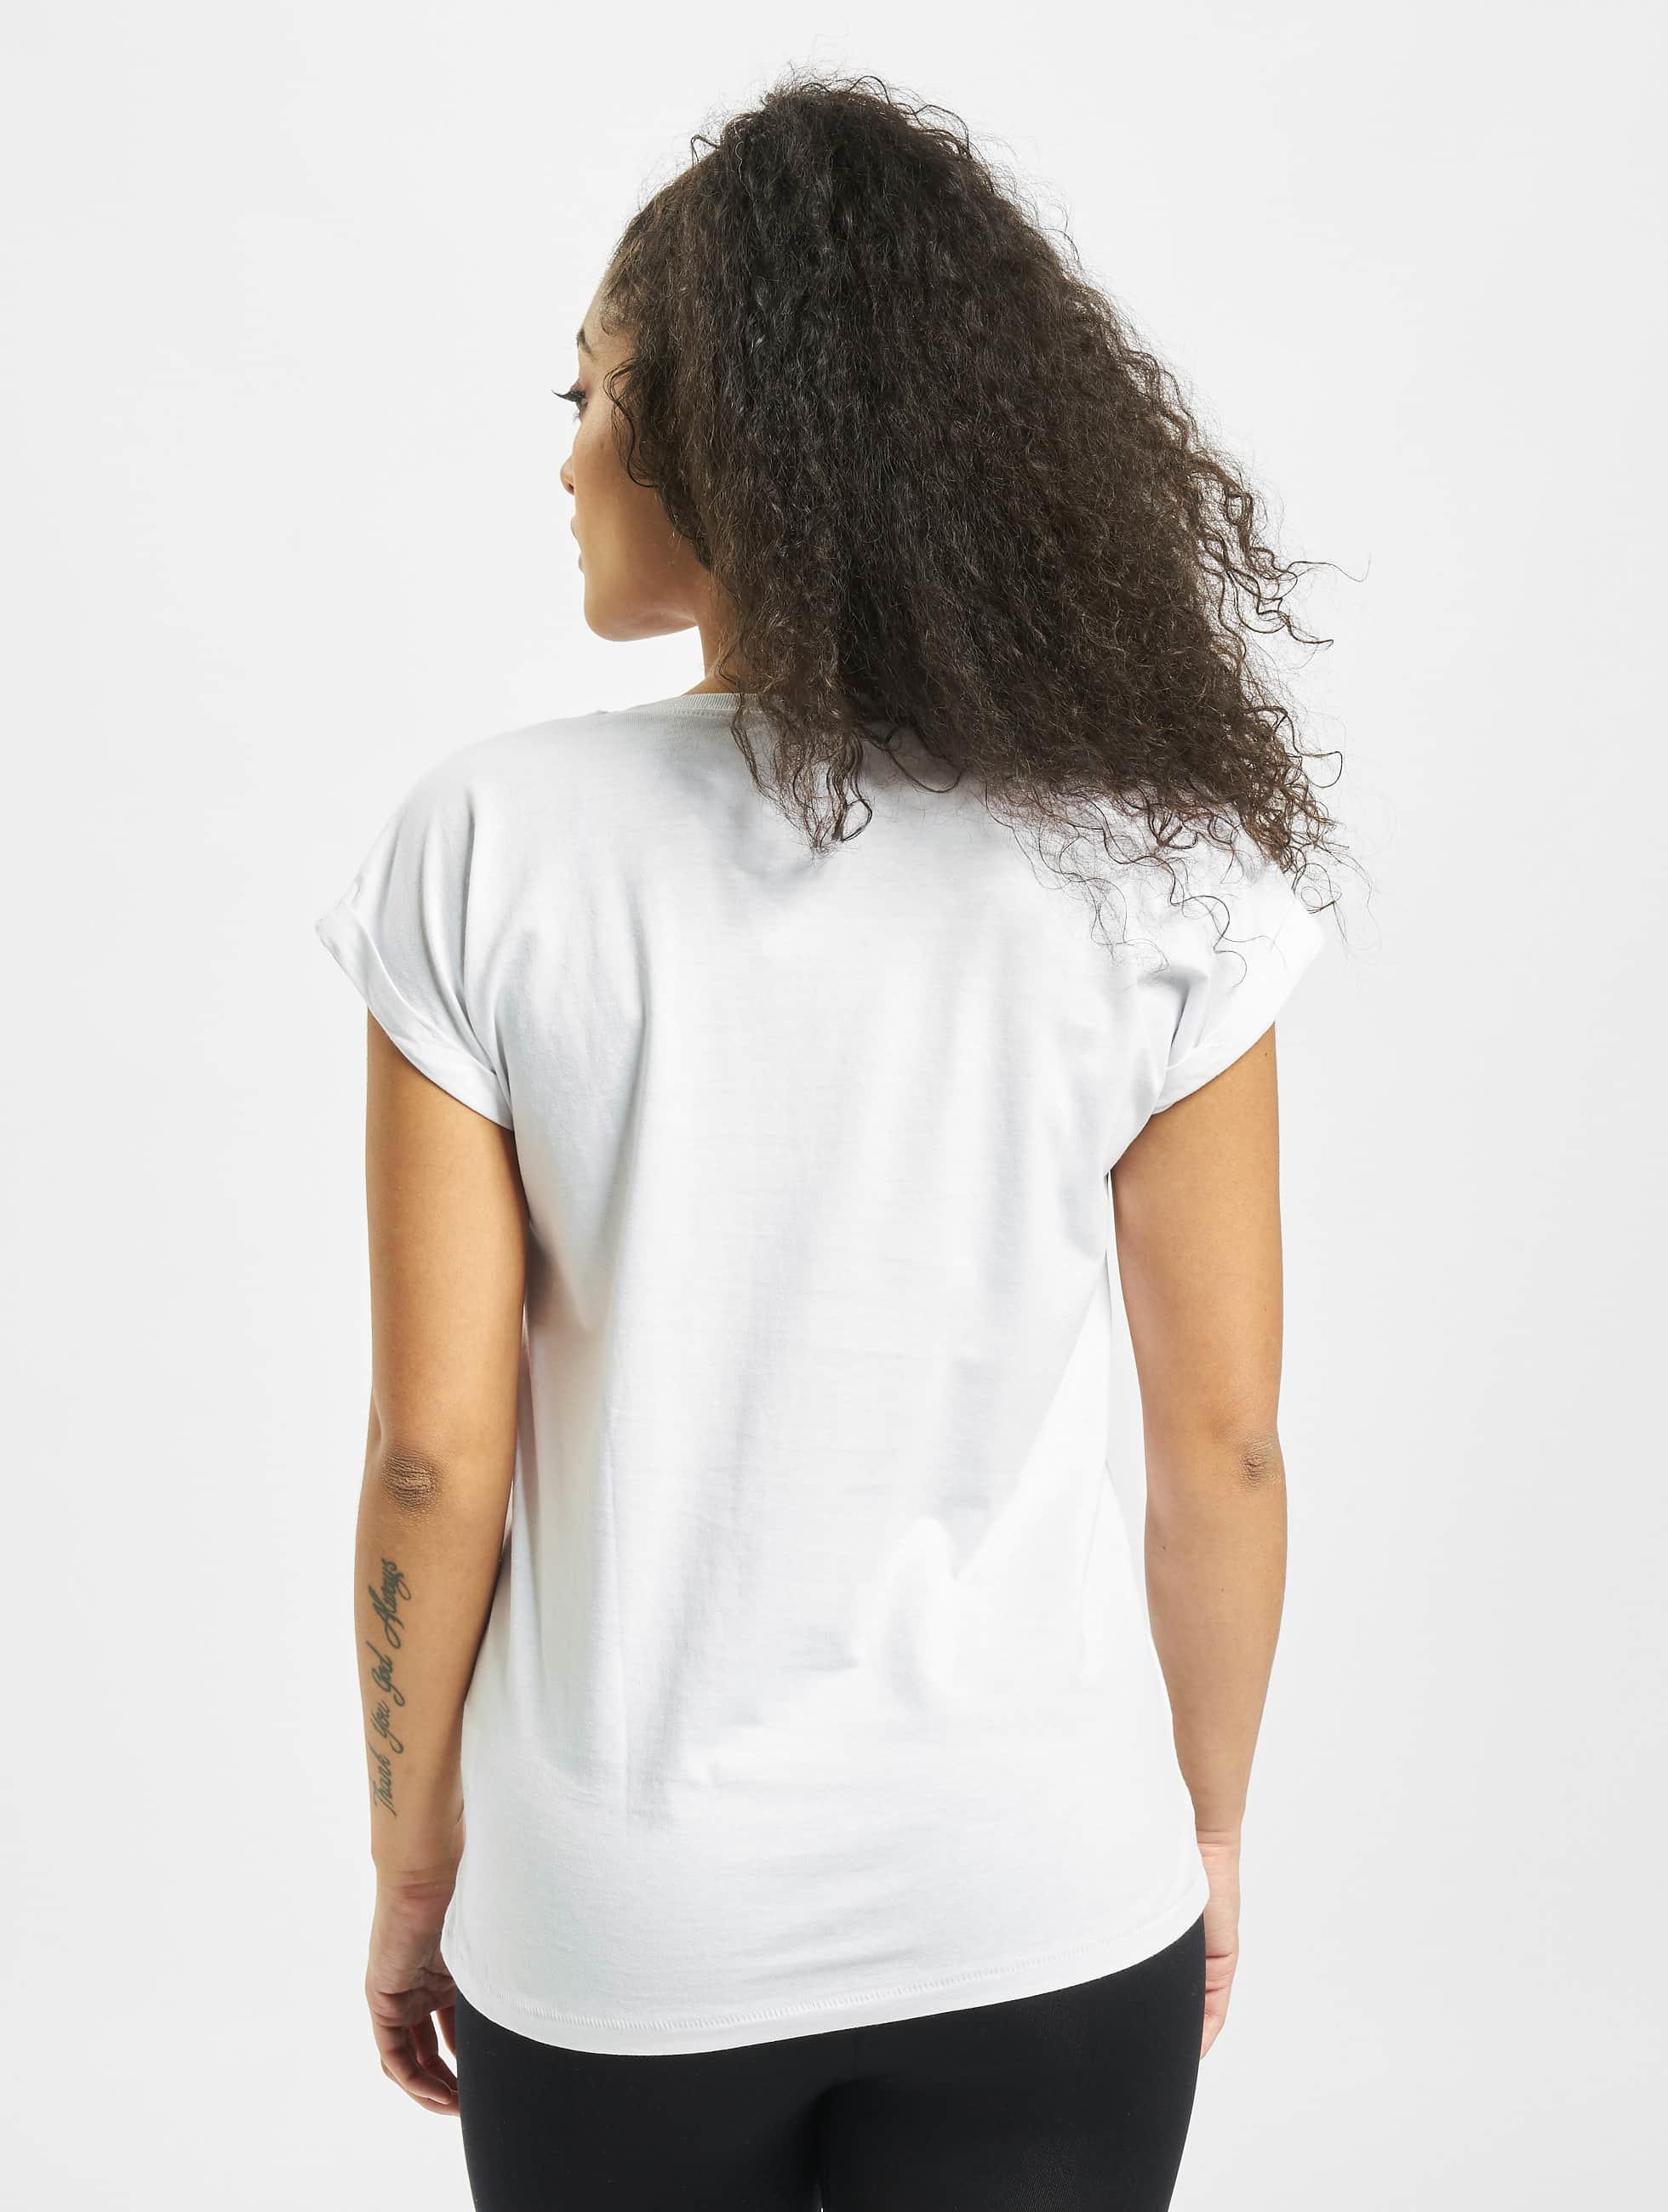 Mister Tee T-Shirt Ladies Parental Advisory weiß